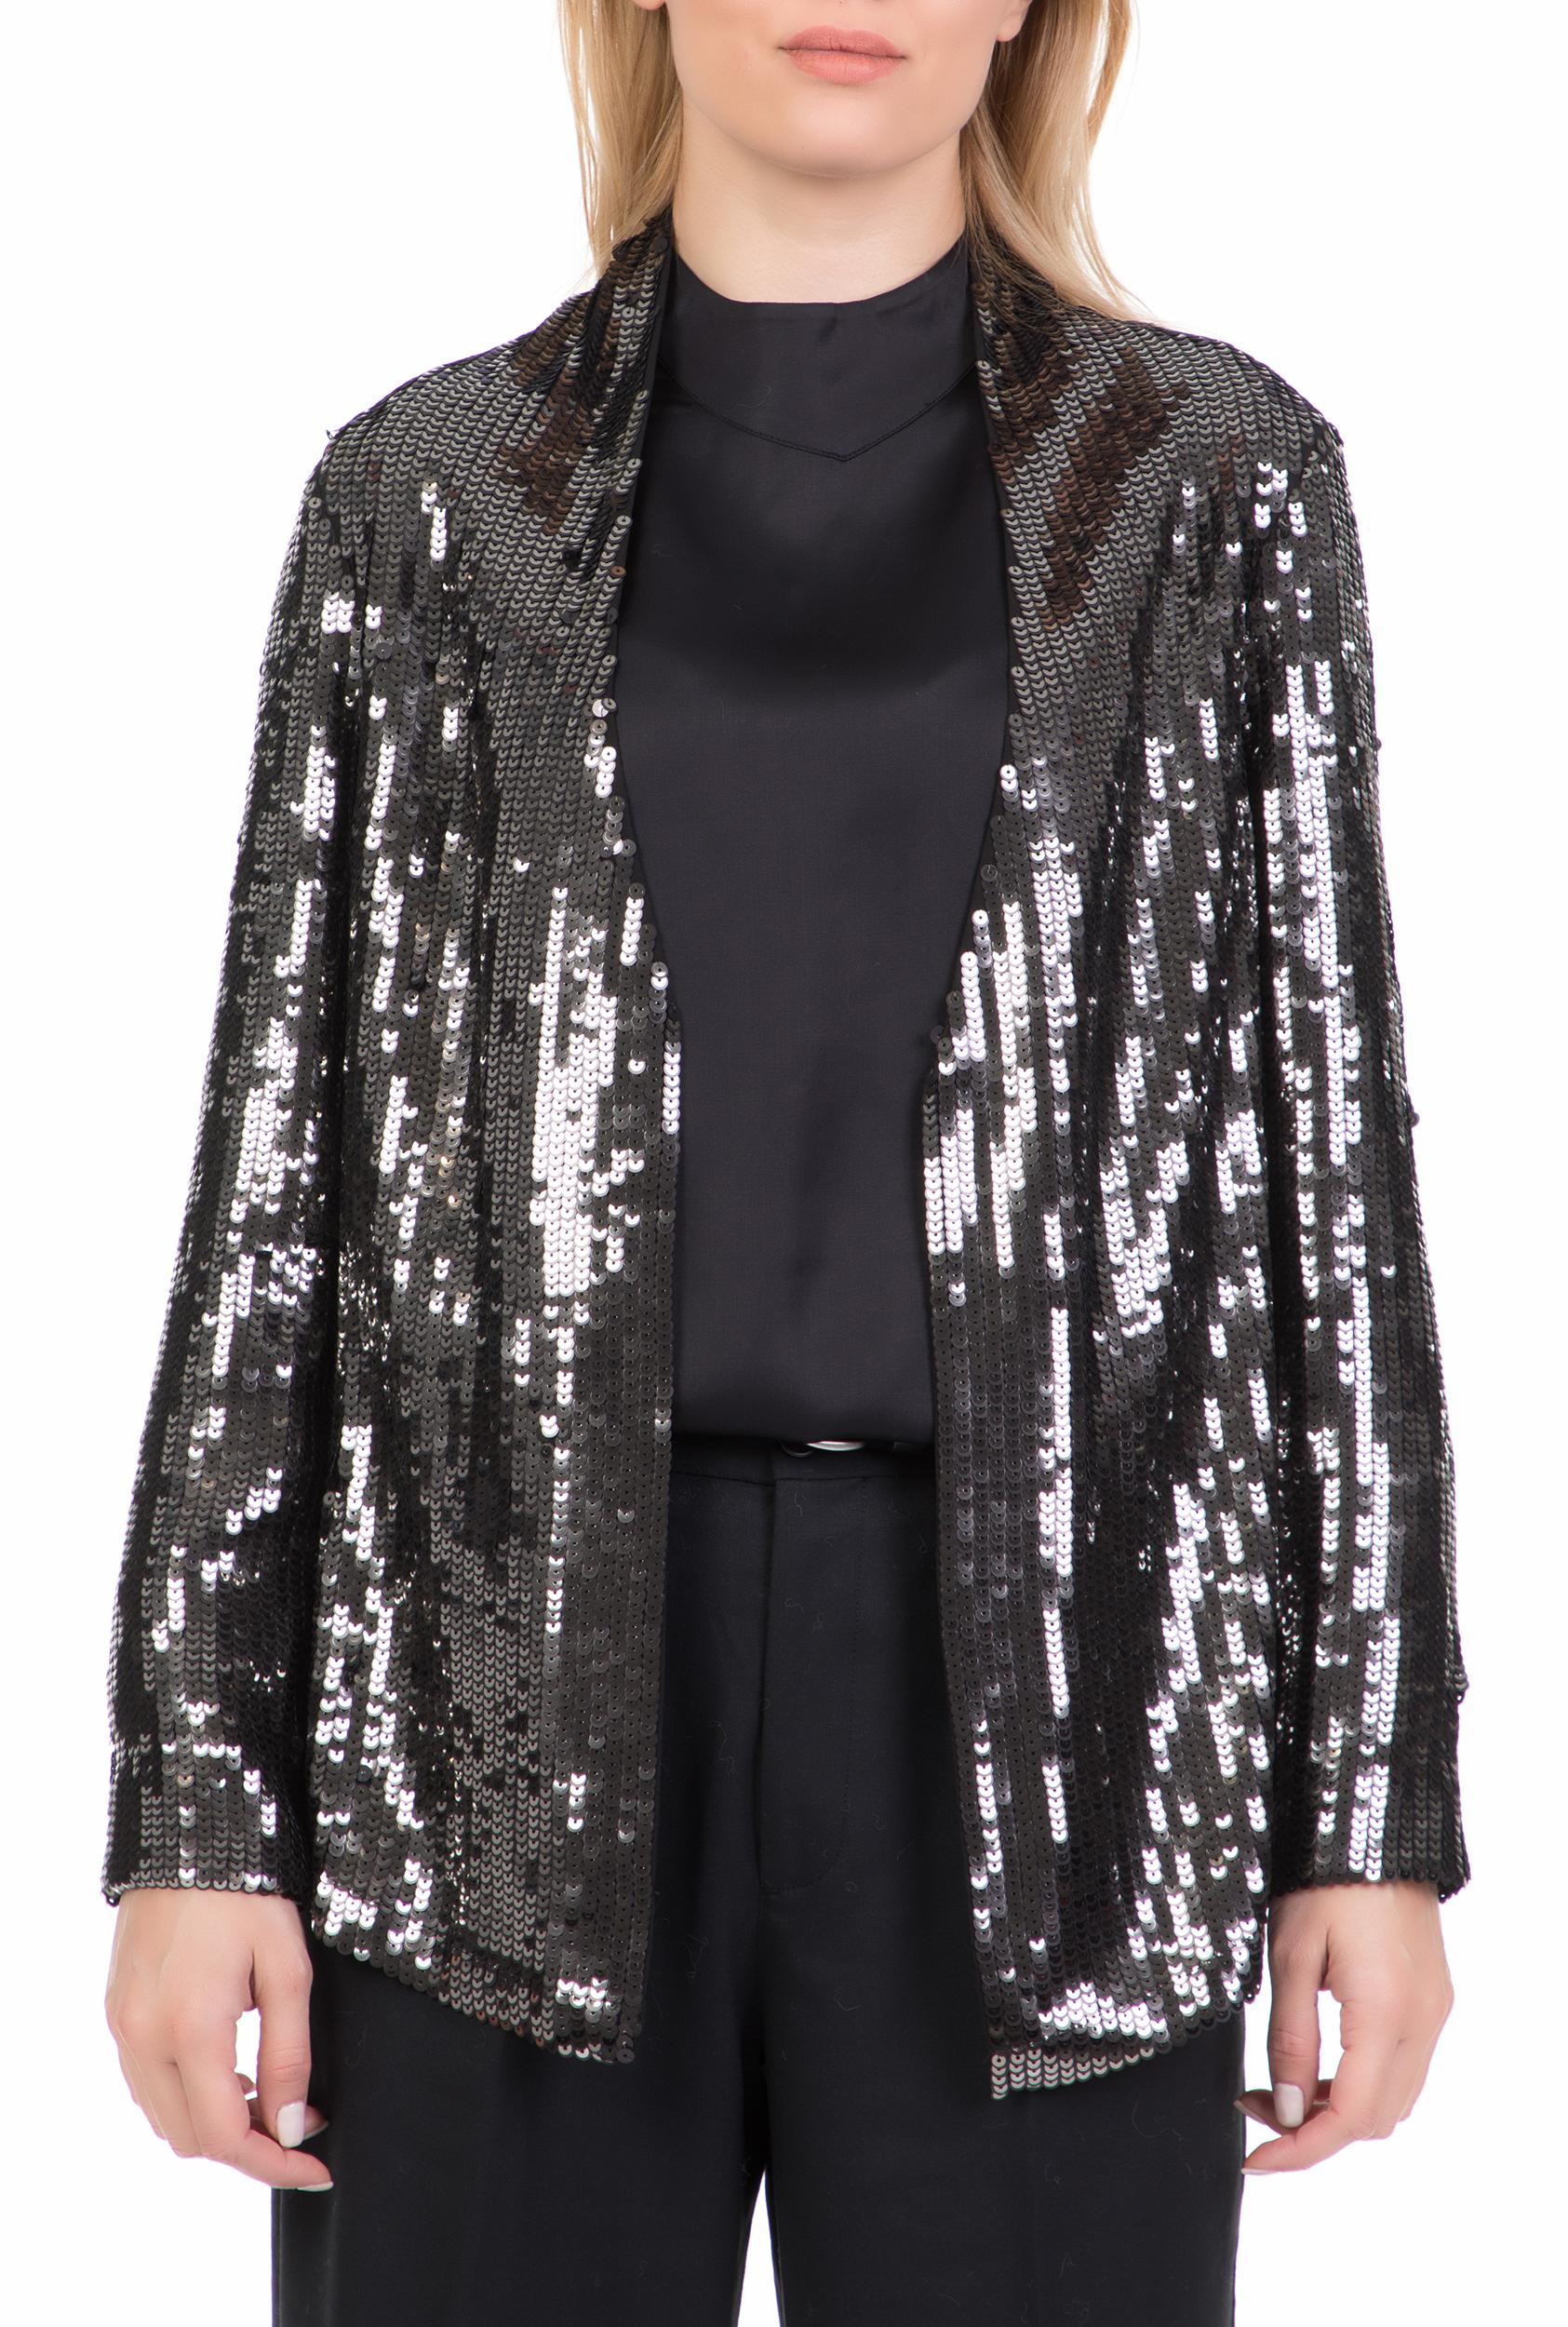 NENETTE - Γυναικείο σακάκι με παγιέτες GIACCA RICAMO PAILLETTES NENETTE ασημί γυναικεία ρούχα πανωφόρια σακάκια